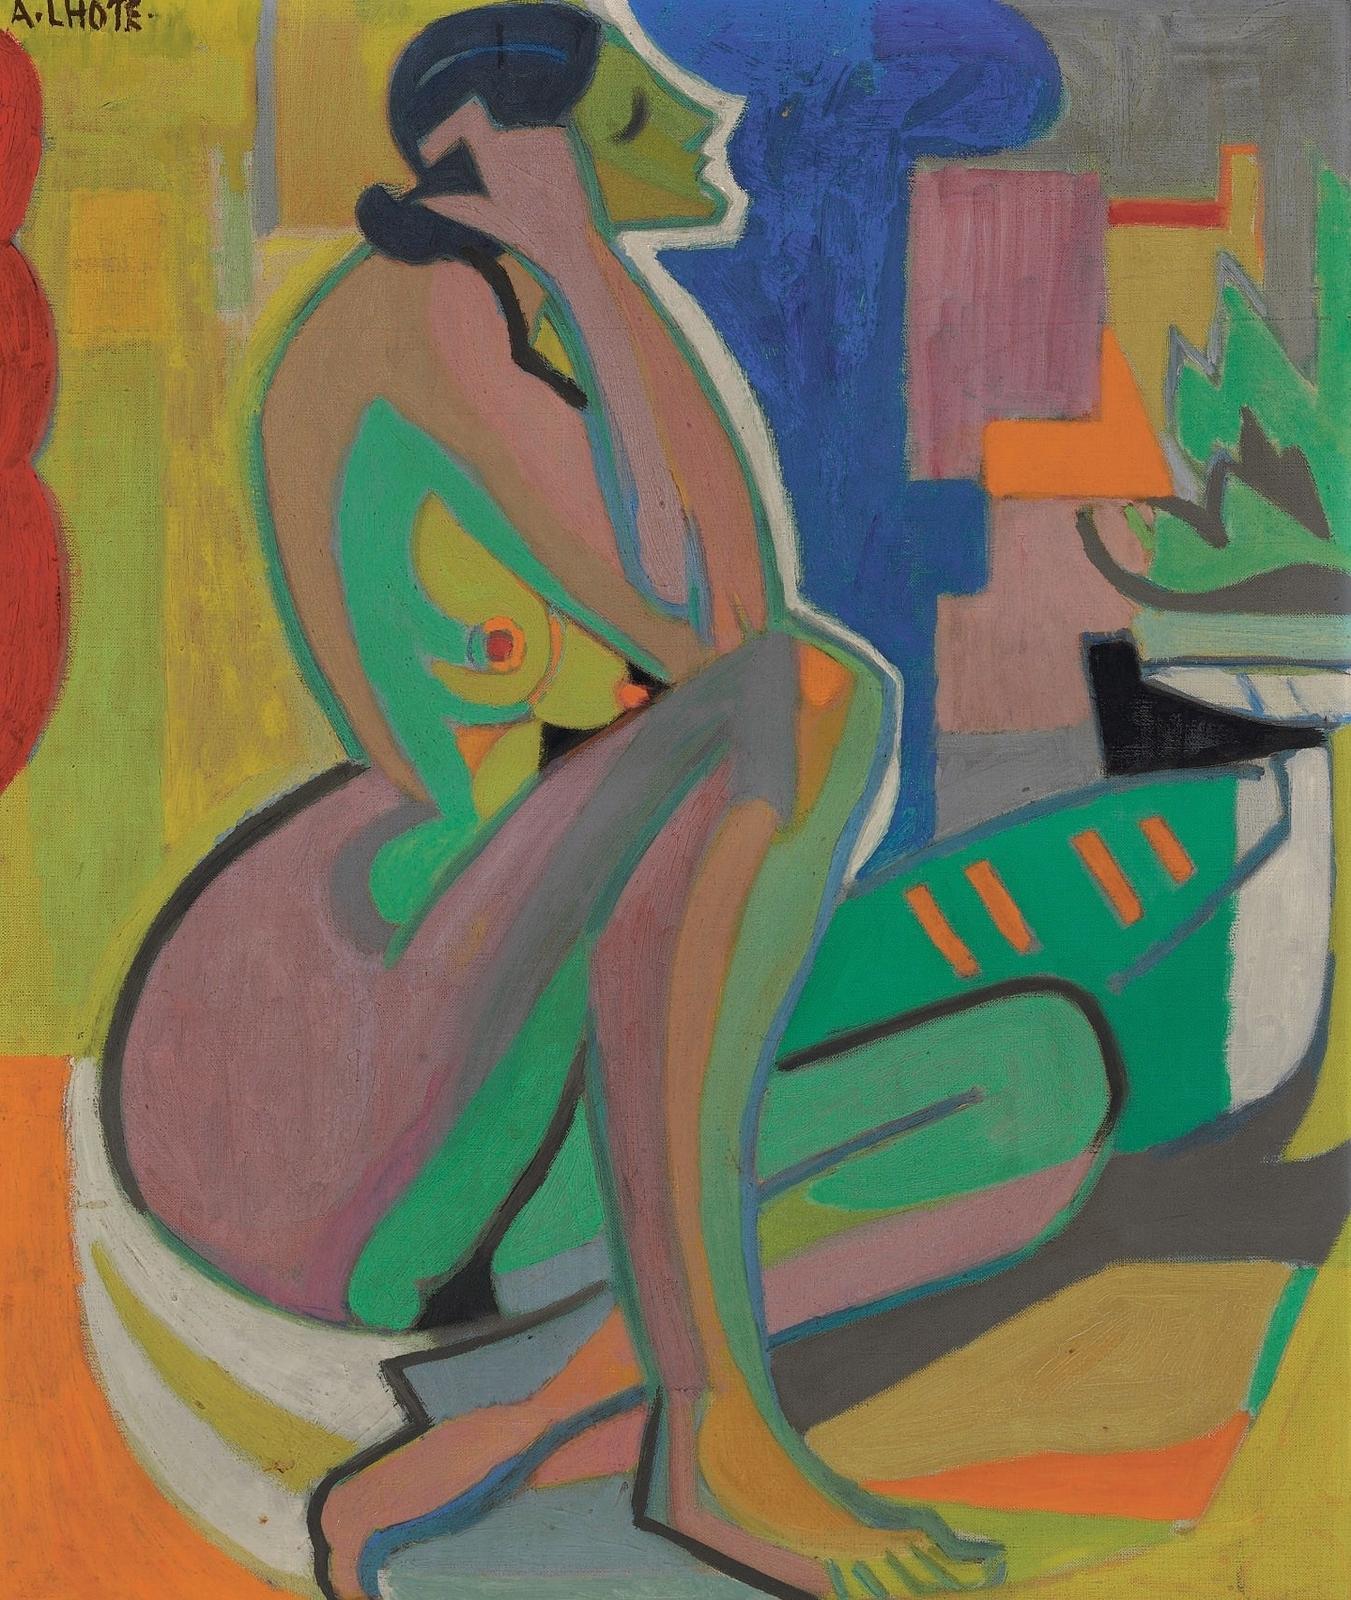 Андре Лот. Сидящая женщина (Femme assise). 54.6 x 45.7. Холст, масло. Частное собрание.